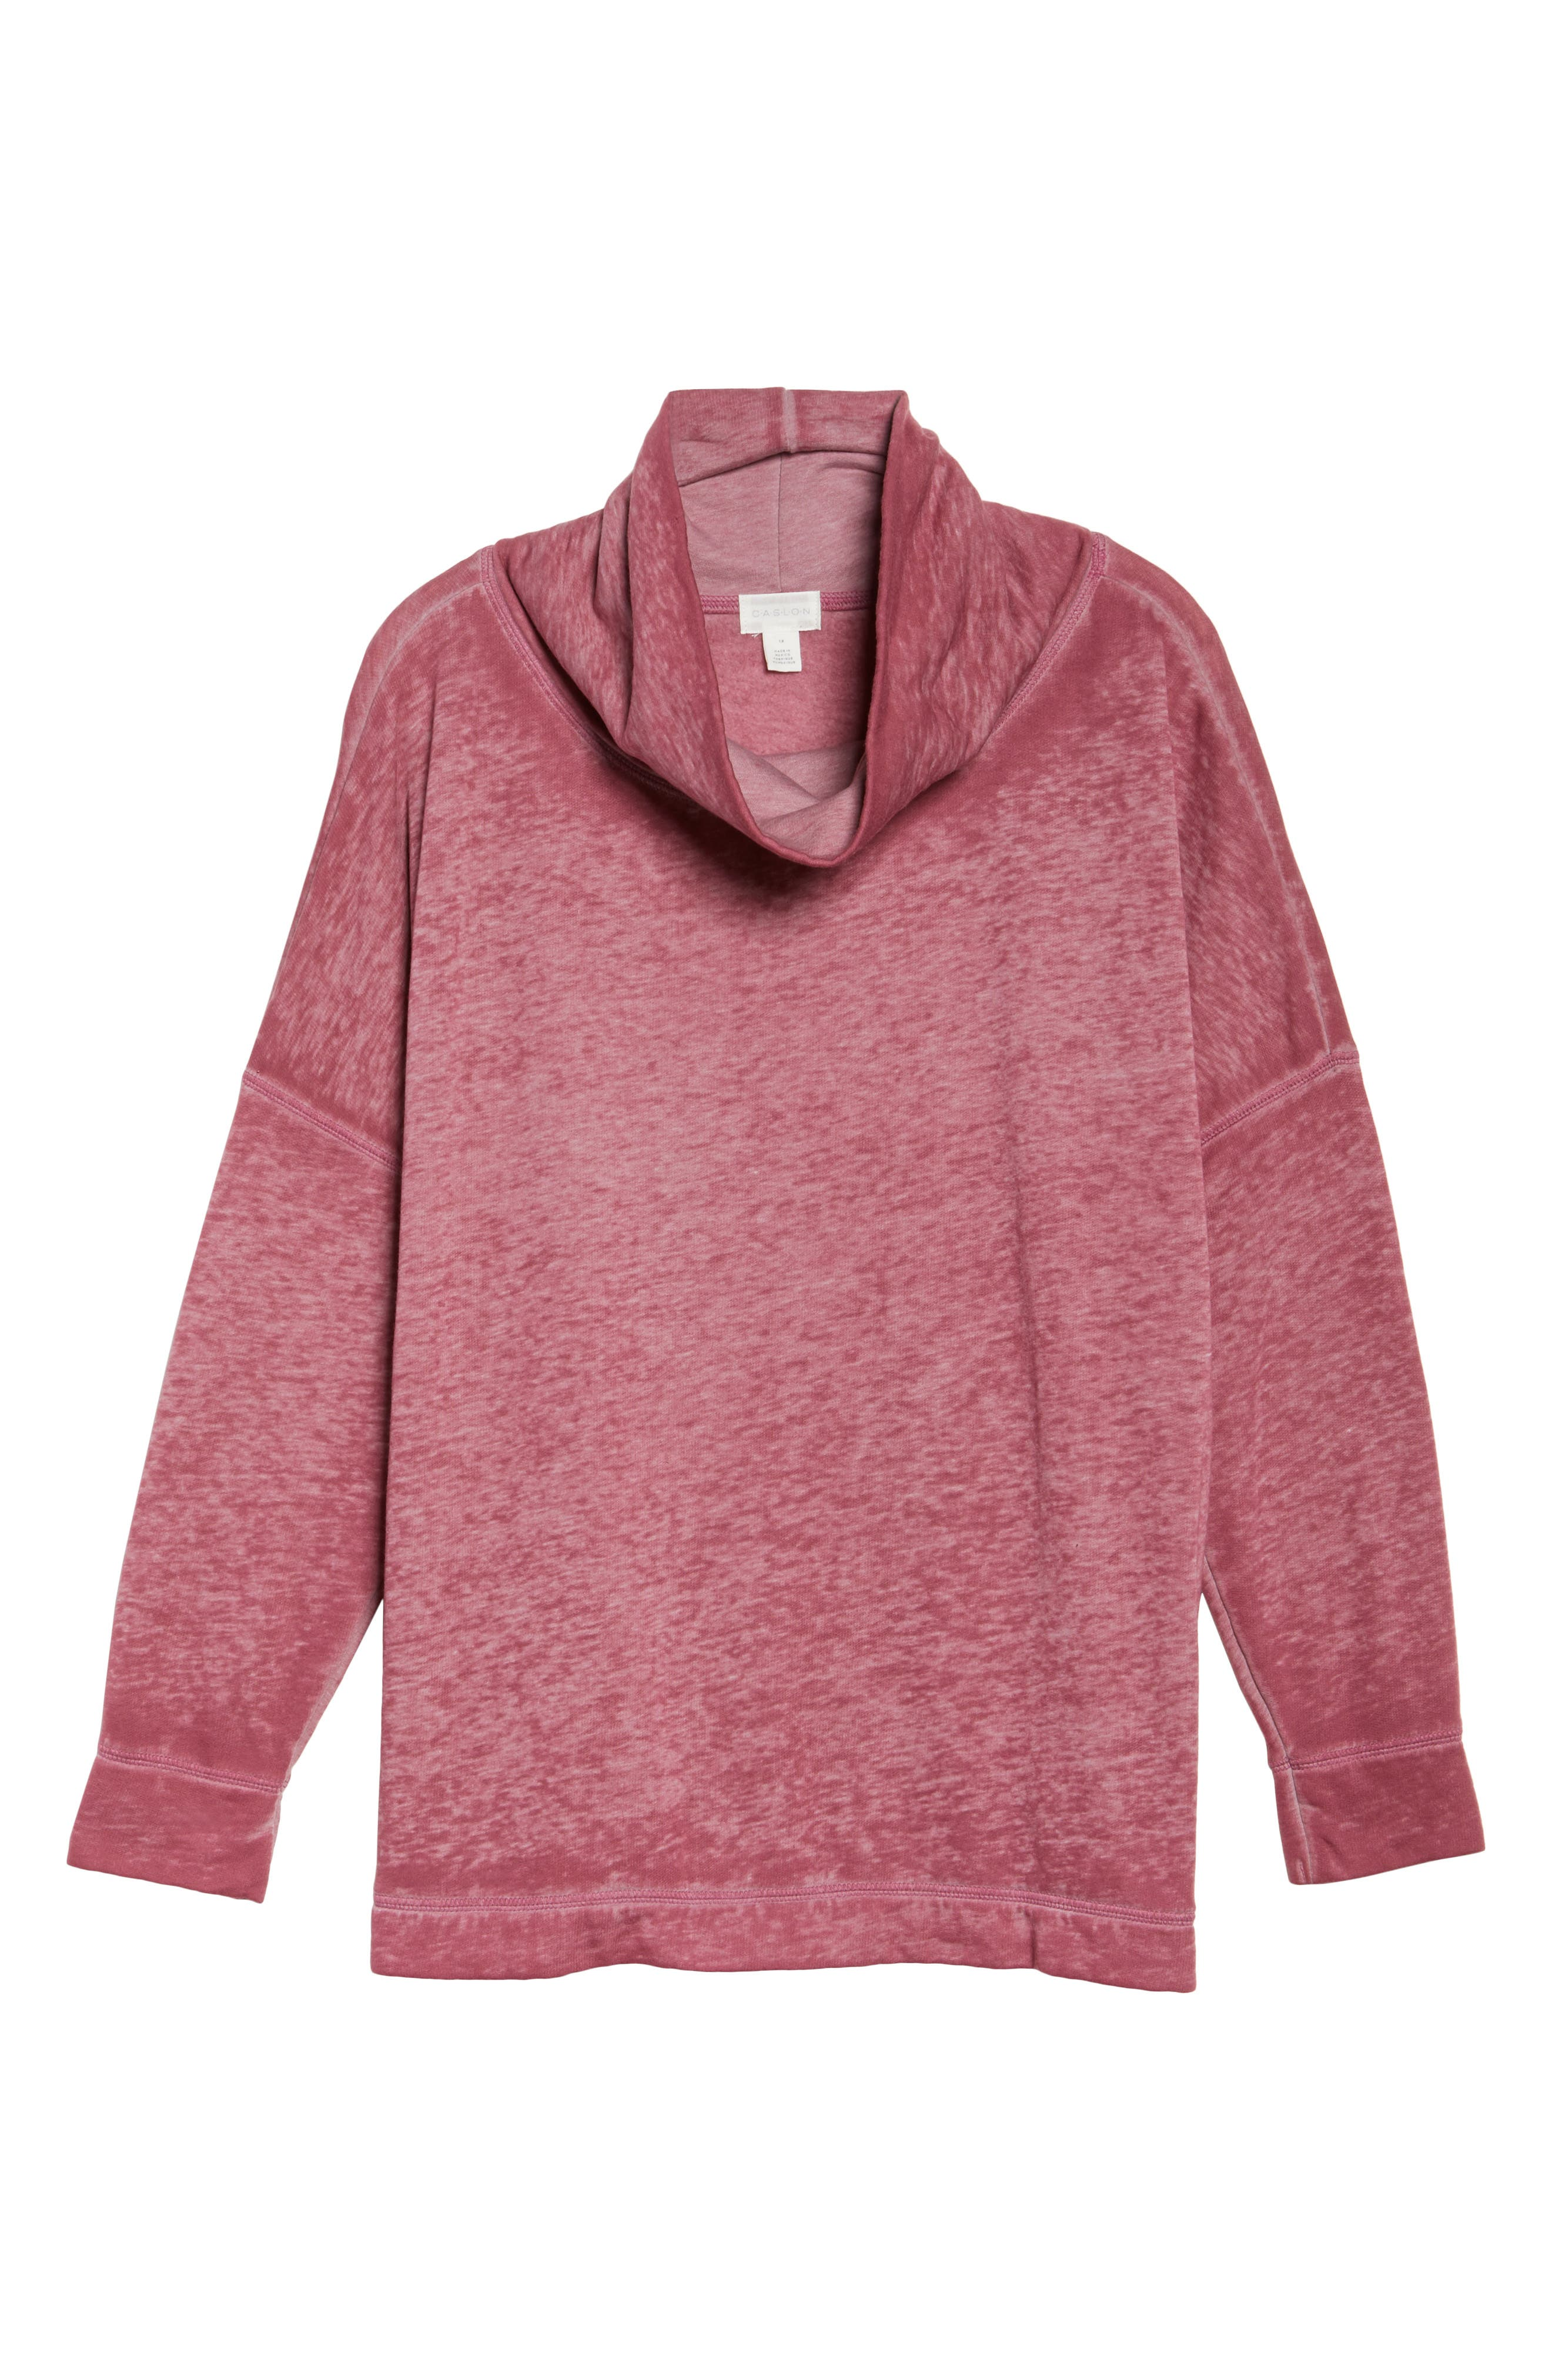 Pleat Back Sweatshirt,                             Alternate thumbnail 6, color,                             Burgundy Thorn